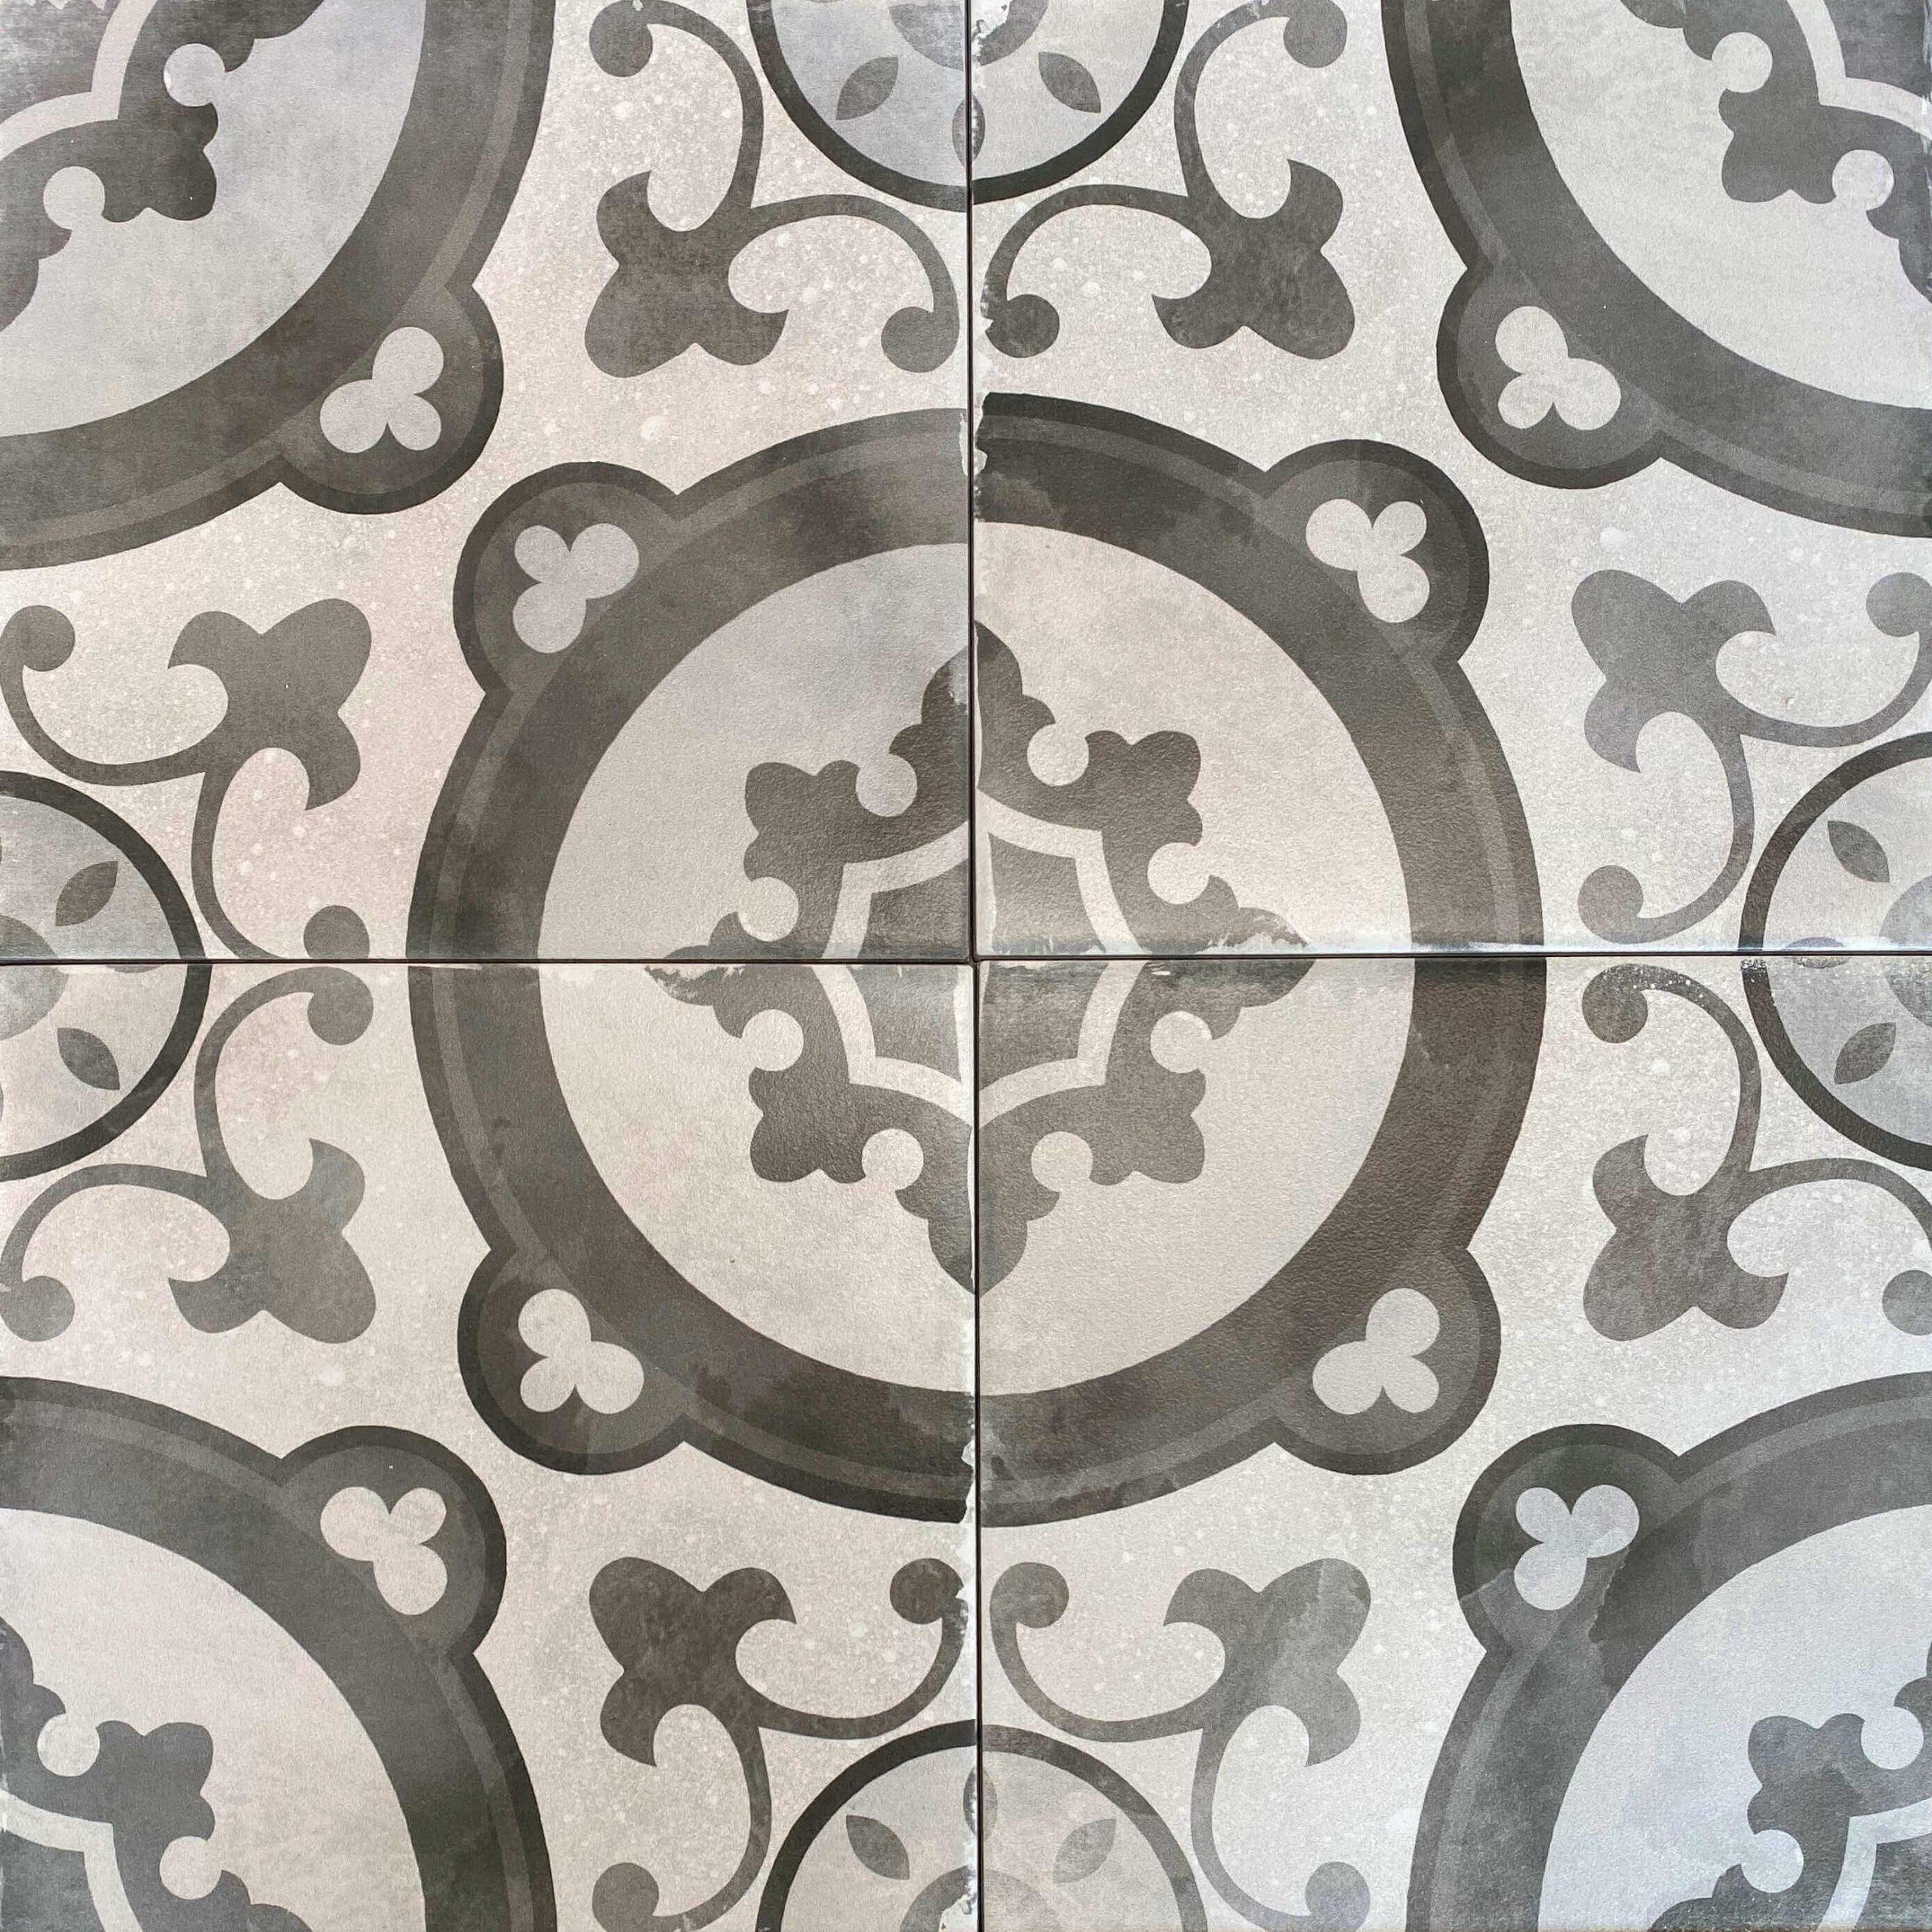 Retro Grey & White Matt Patterned Non Rectified Glazed Porcelain Wall & Floor Tile 200x200mm 3447